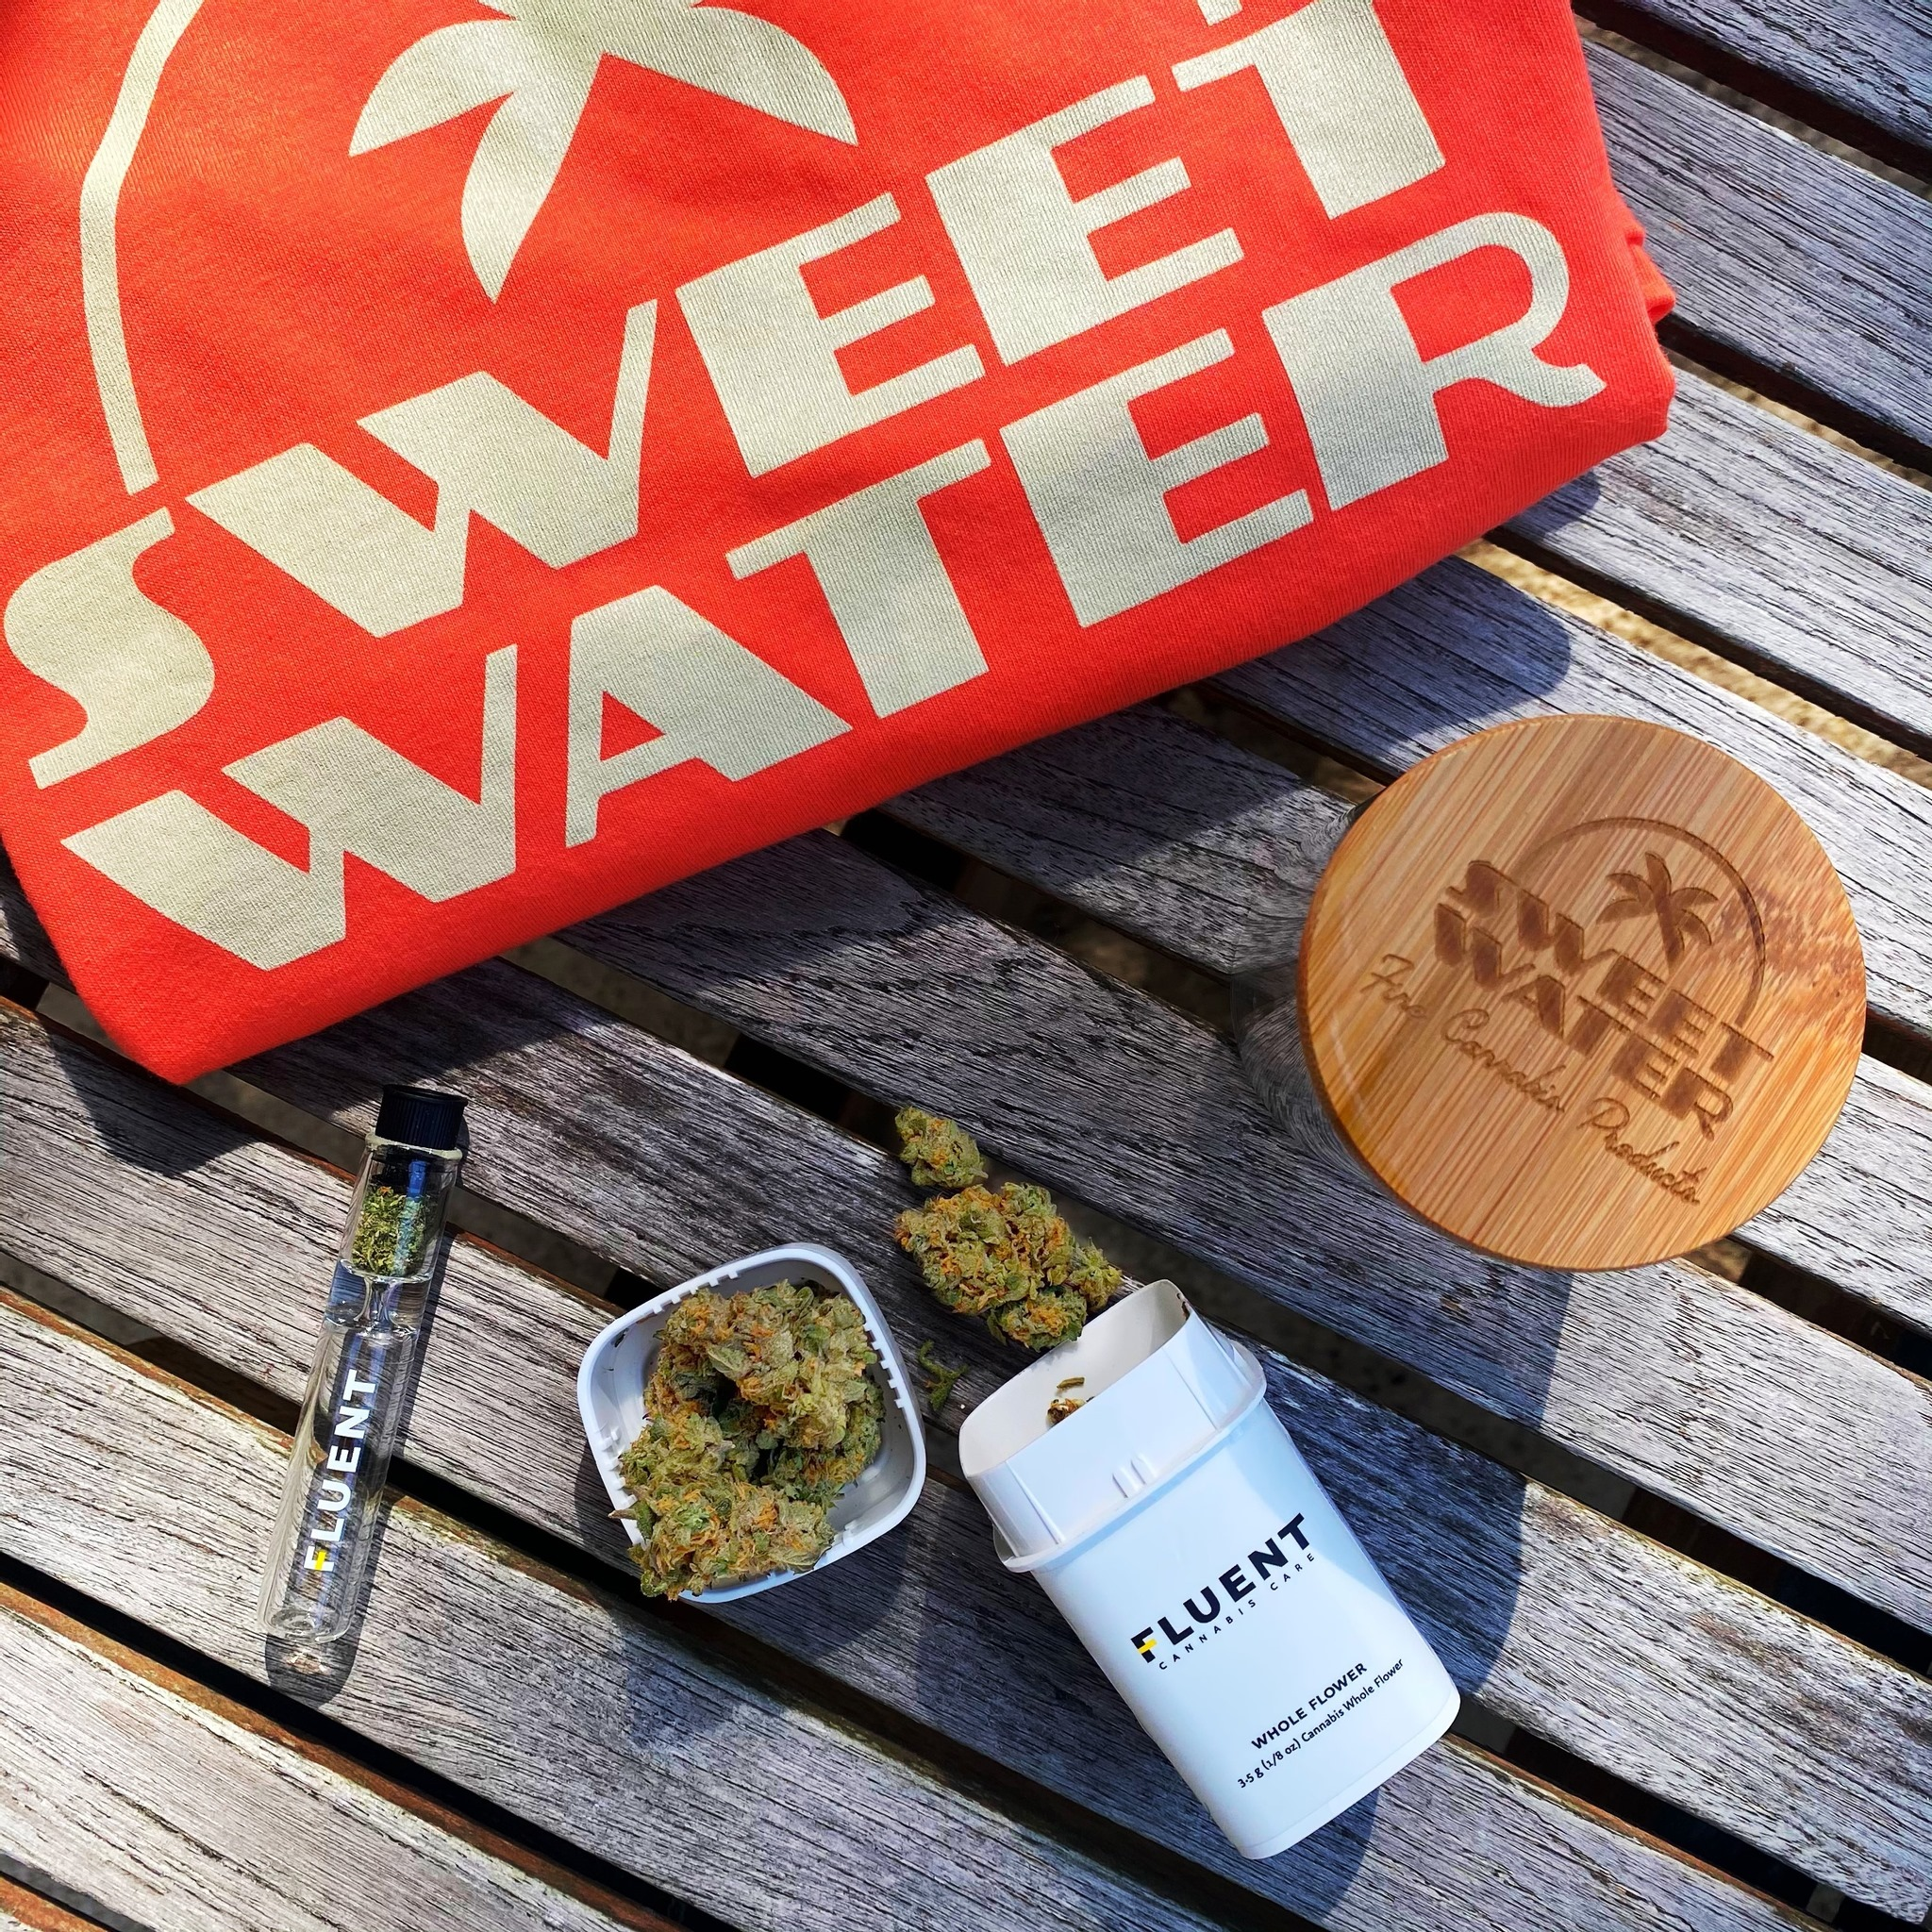 FLUENT Cannabis Dispensary - Lake Worth